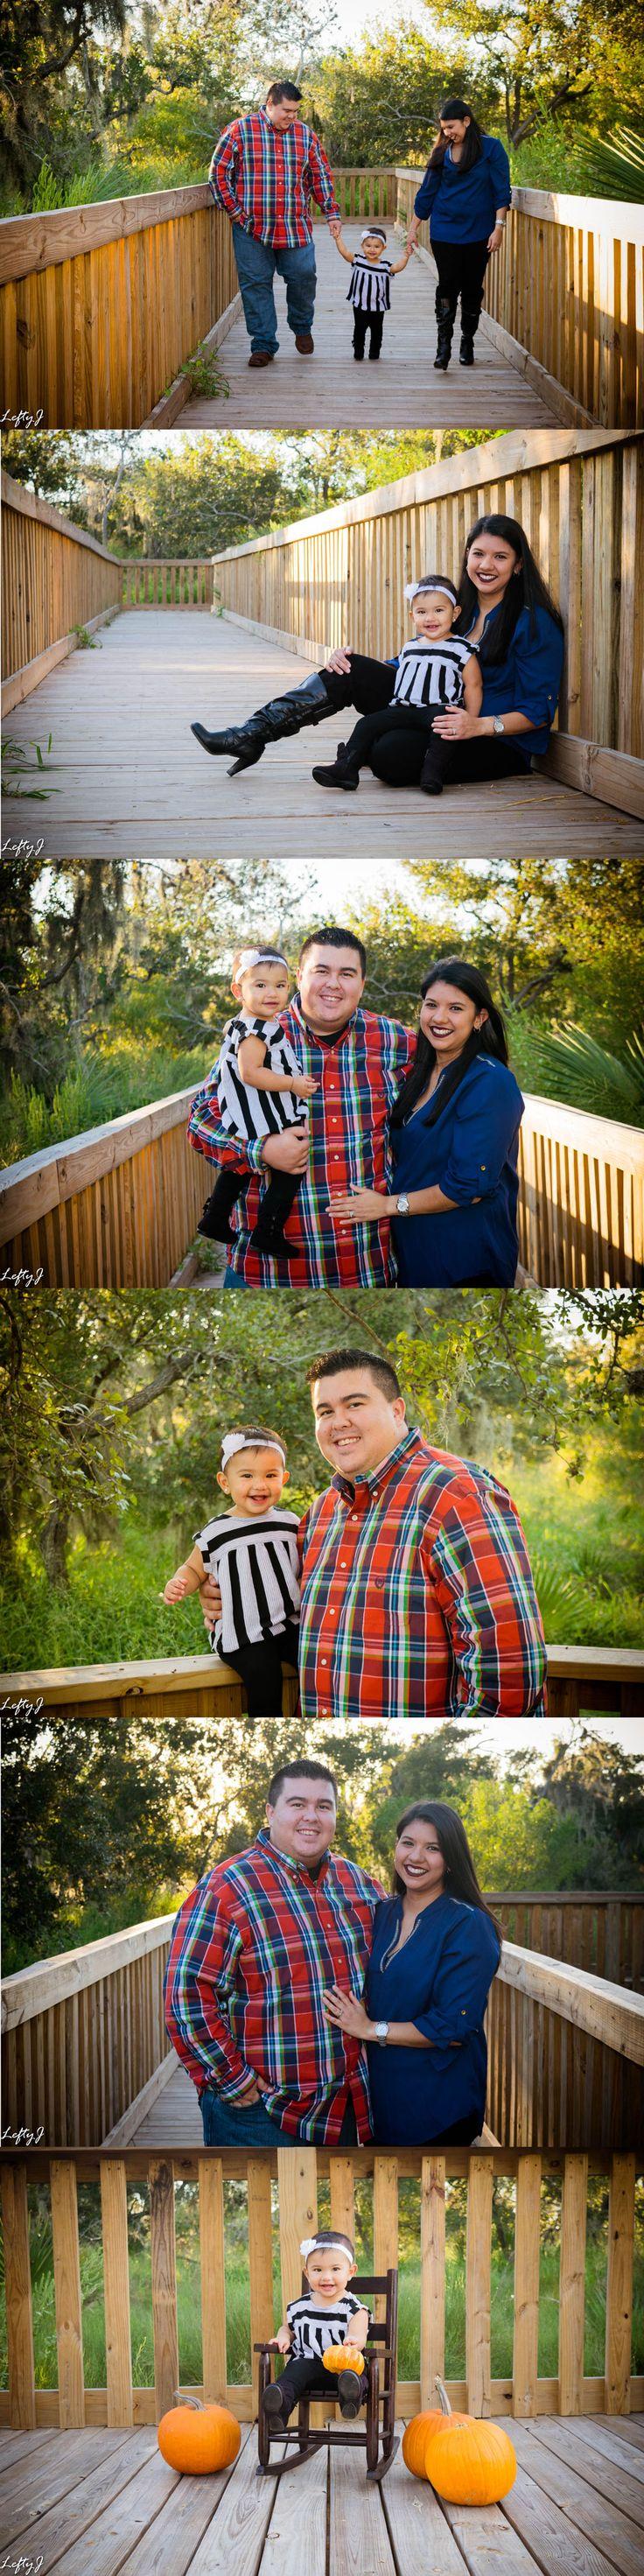 Fall family photos in Corpus Christi, TX. #corpuschristiphotography #corpuschristiphotographer #familyphotos #fallfamilyphotos #familyphotoshoot #fallfamilyphotoshoot